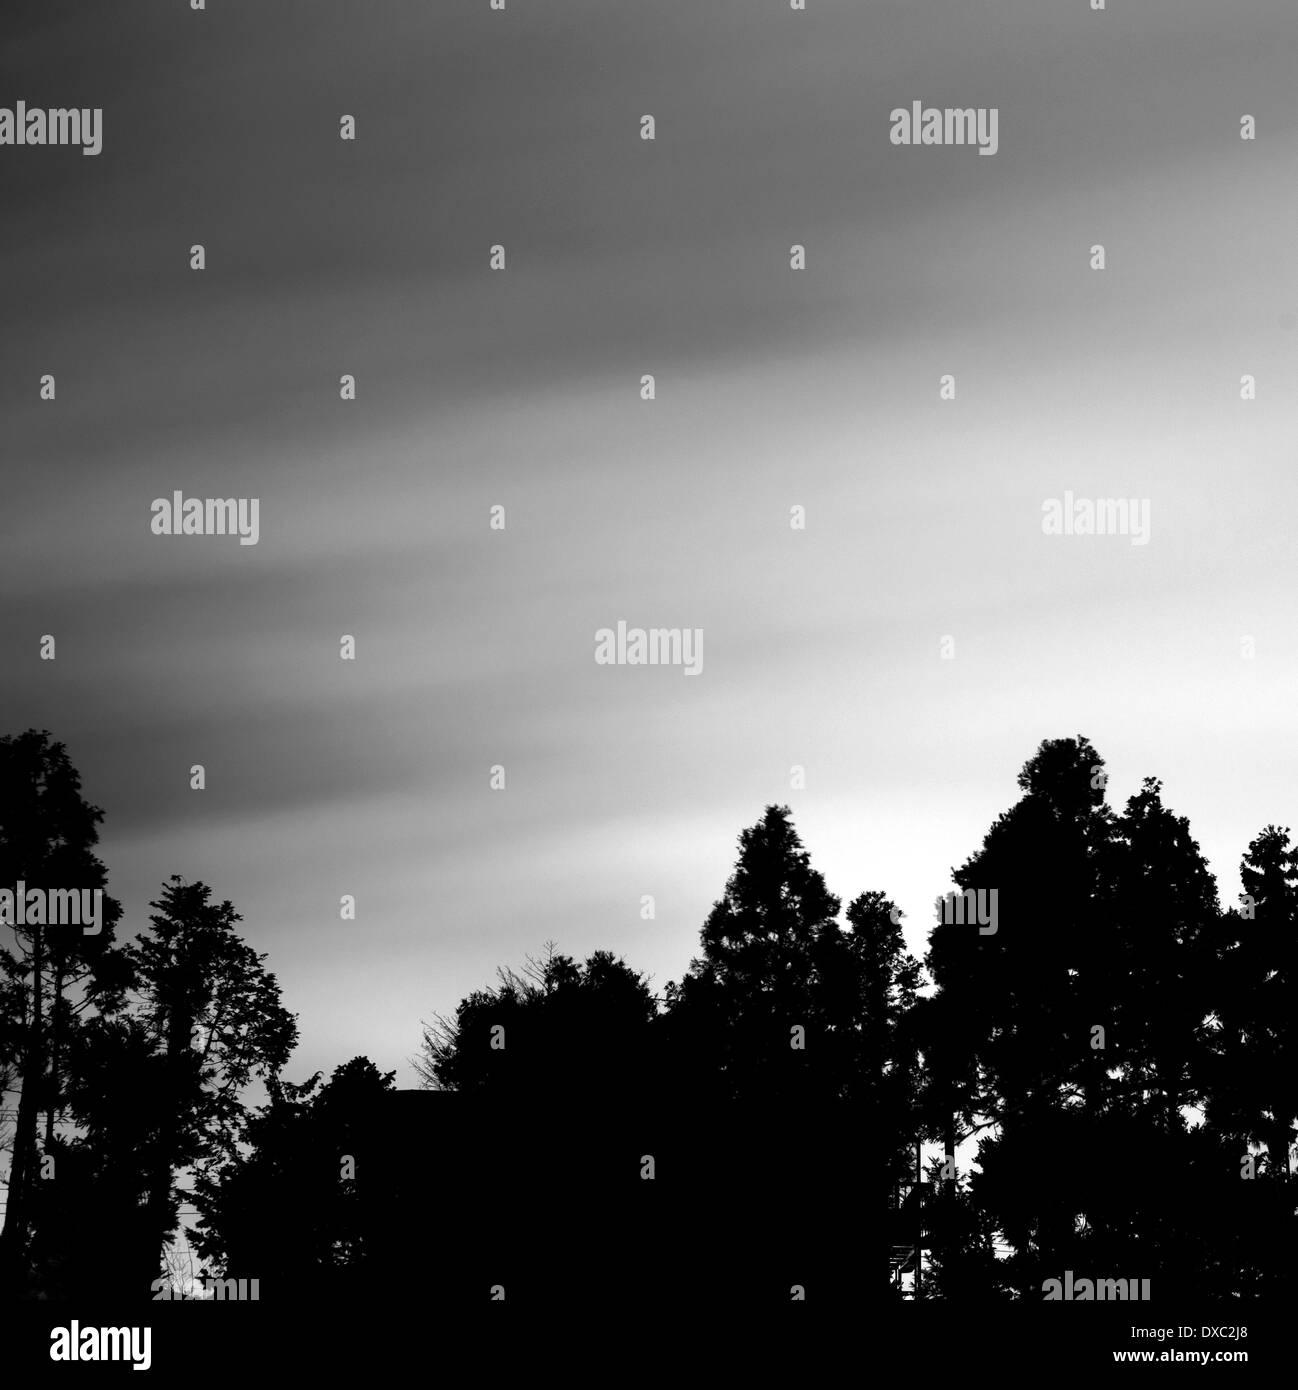 Trees in Yamato, Kanagawa Prefecture, Japan - Stock Image